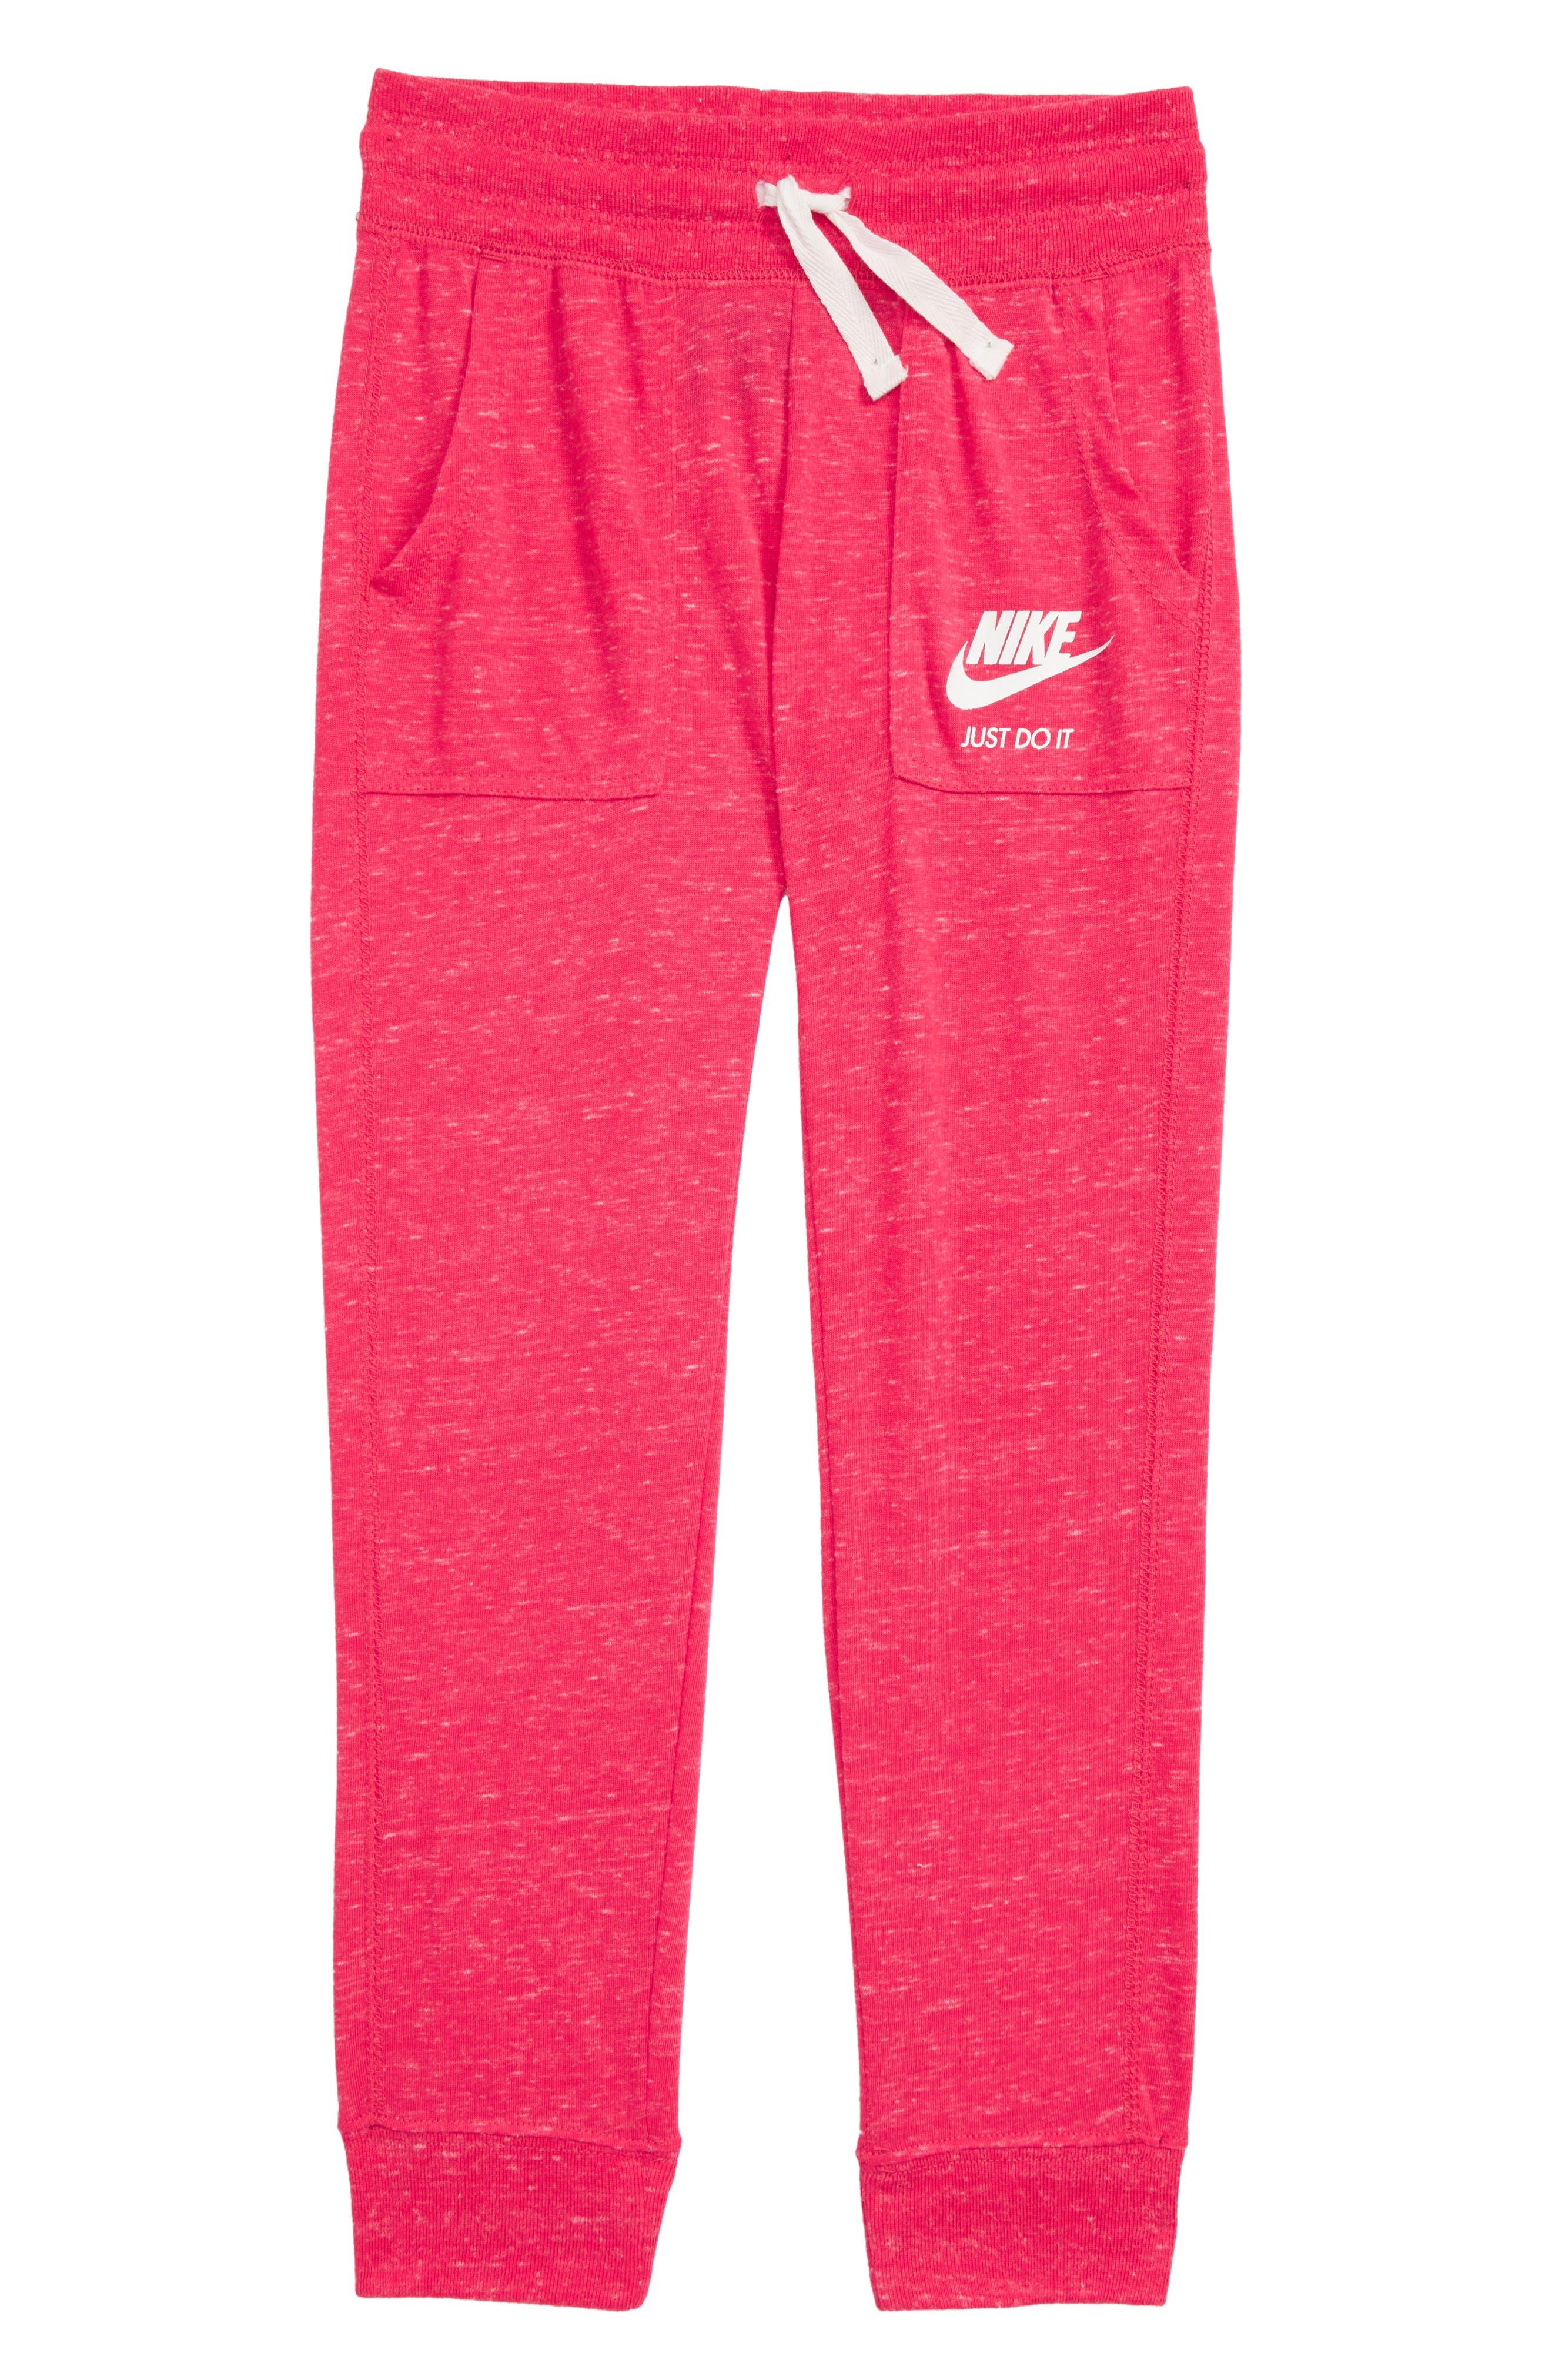 NIKE Gym Vintage Pants, Main, color, 672